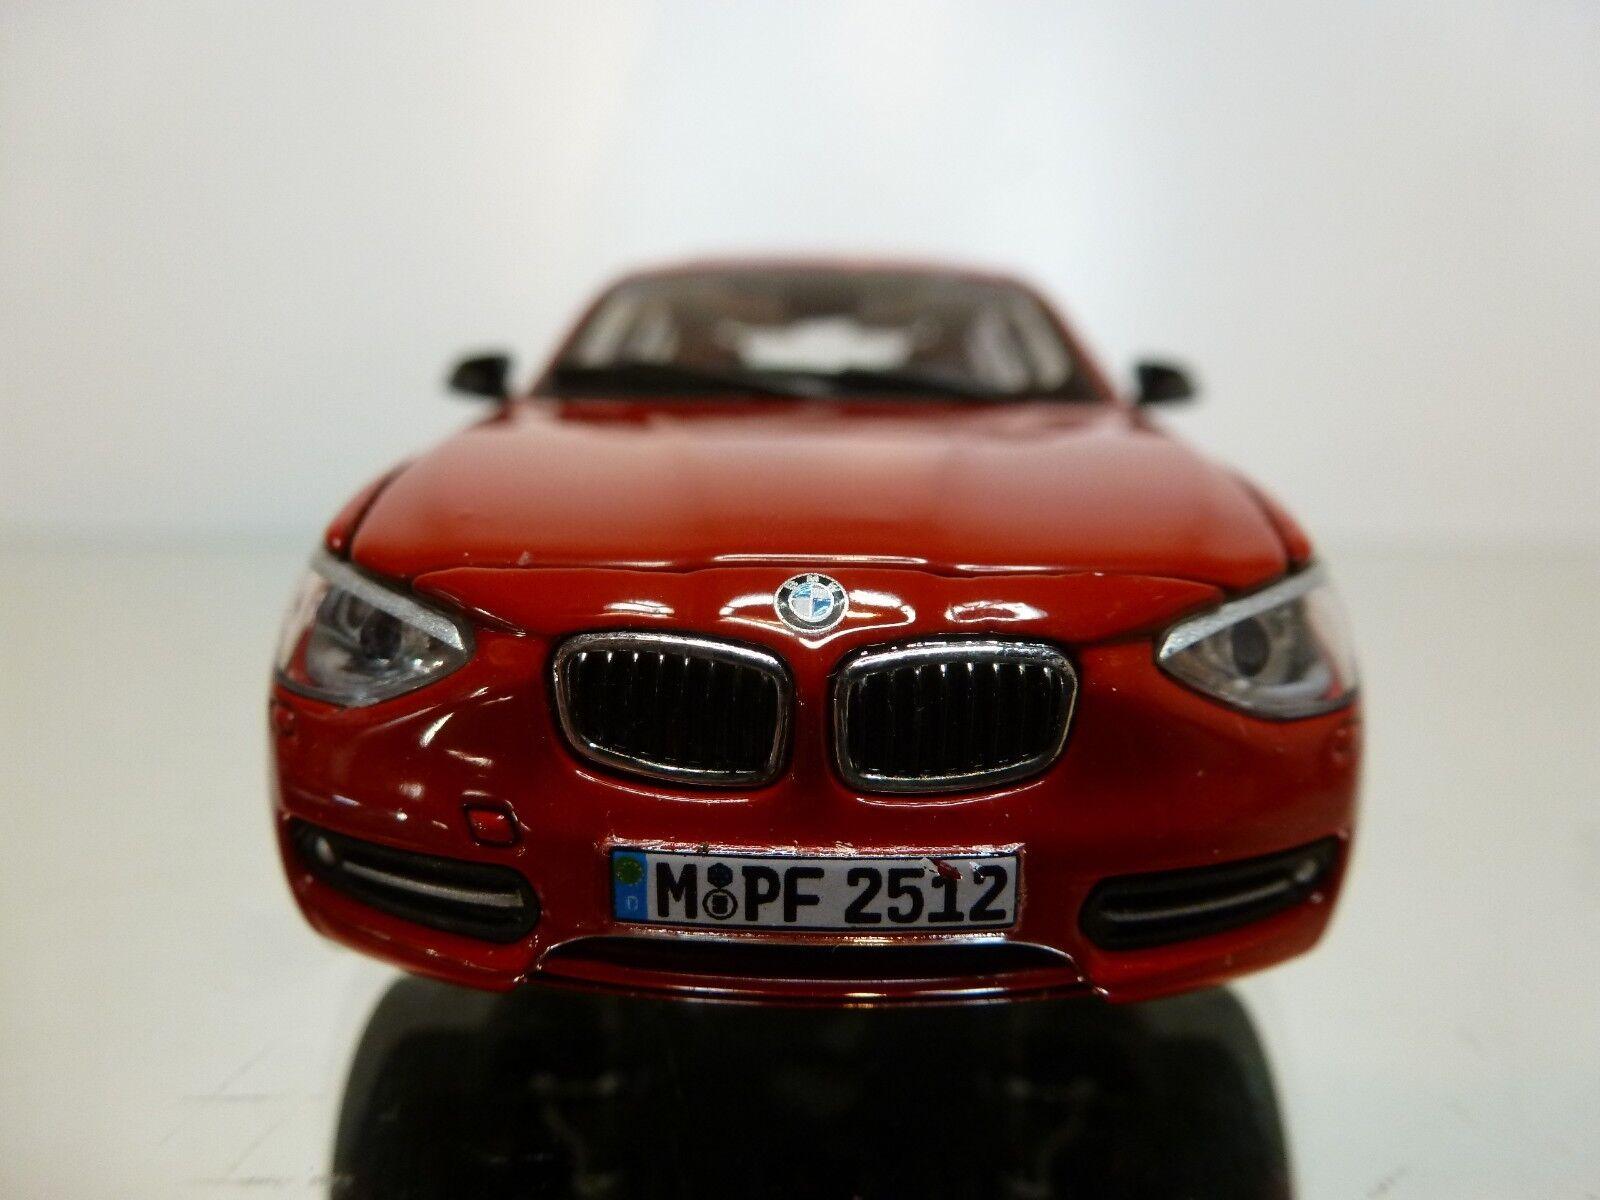 AUTOart AUTOart AUTOart BMW 125i SPORT E87 LCI - 2011 - rojo 1 43 - EXCELLENT CONDITION - 34 8a61f8